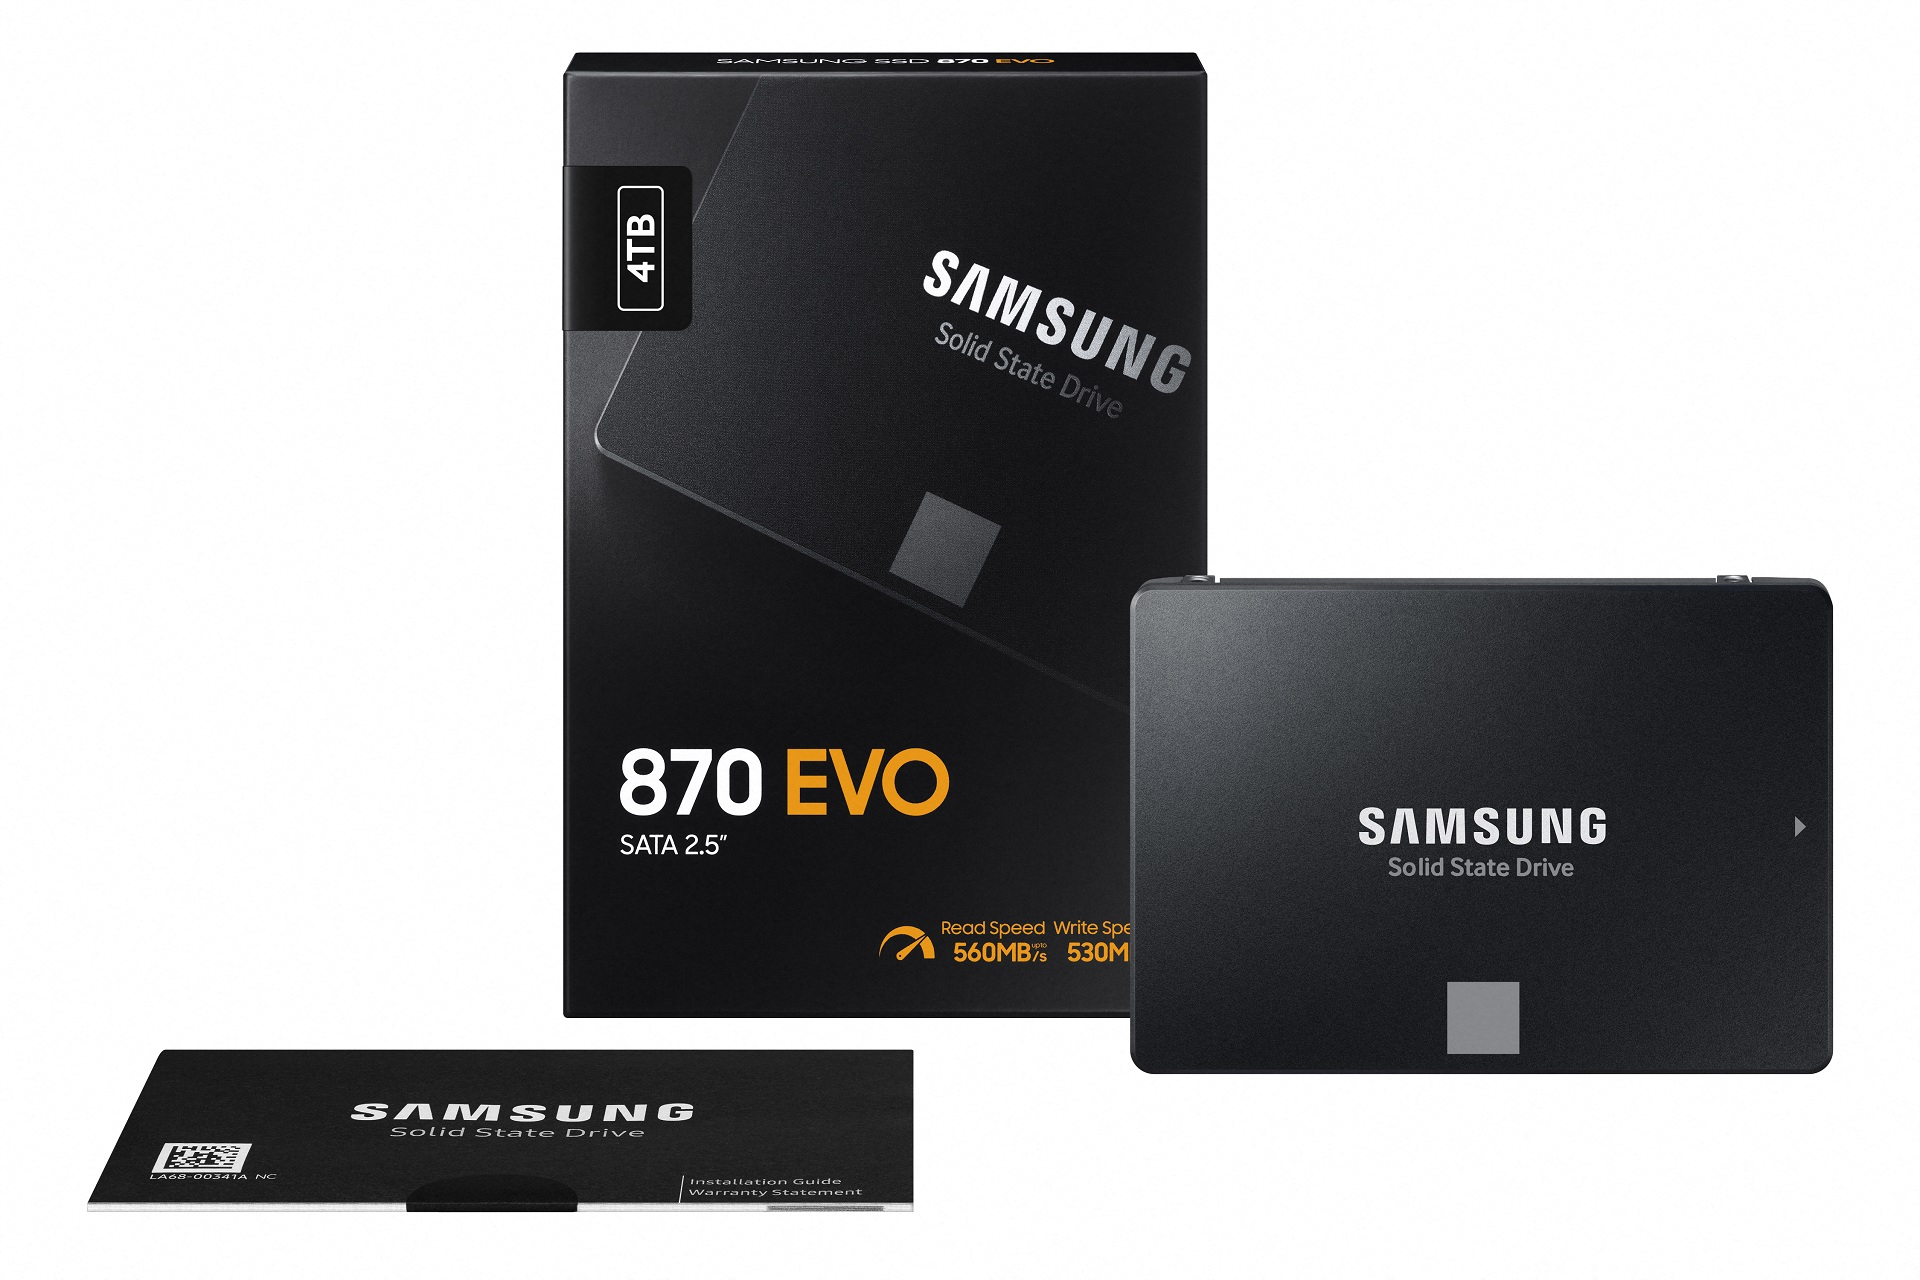 SSD 870 EVO - Packaging